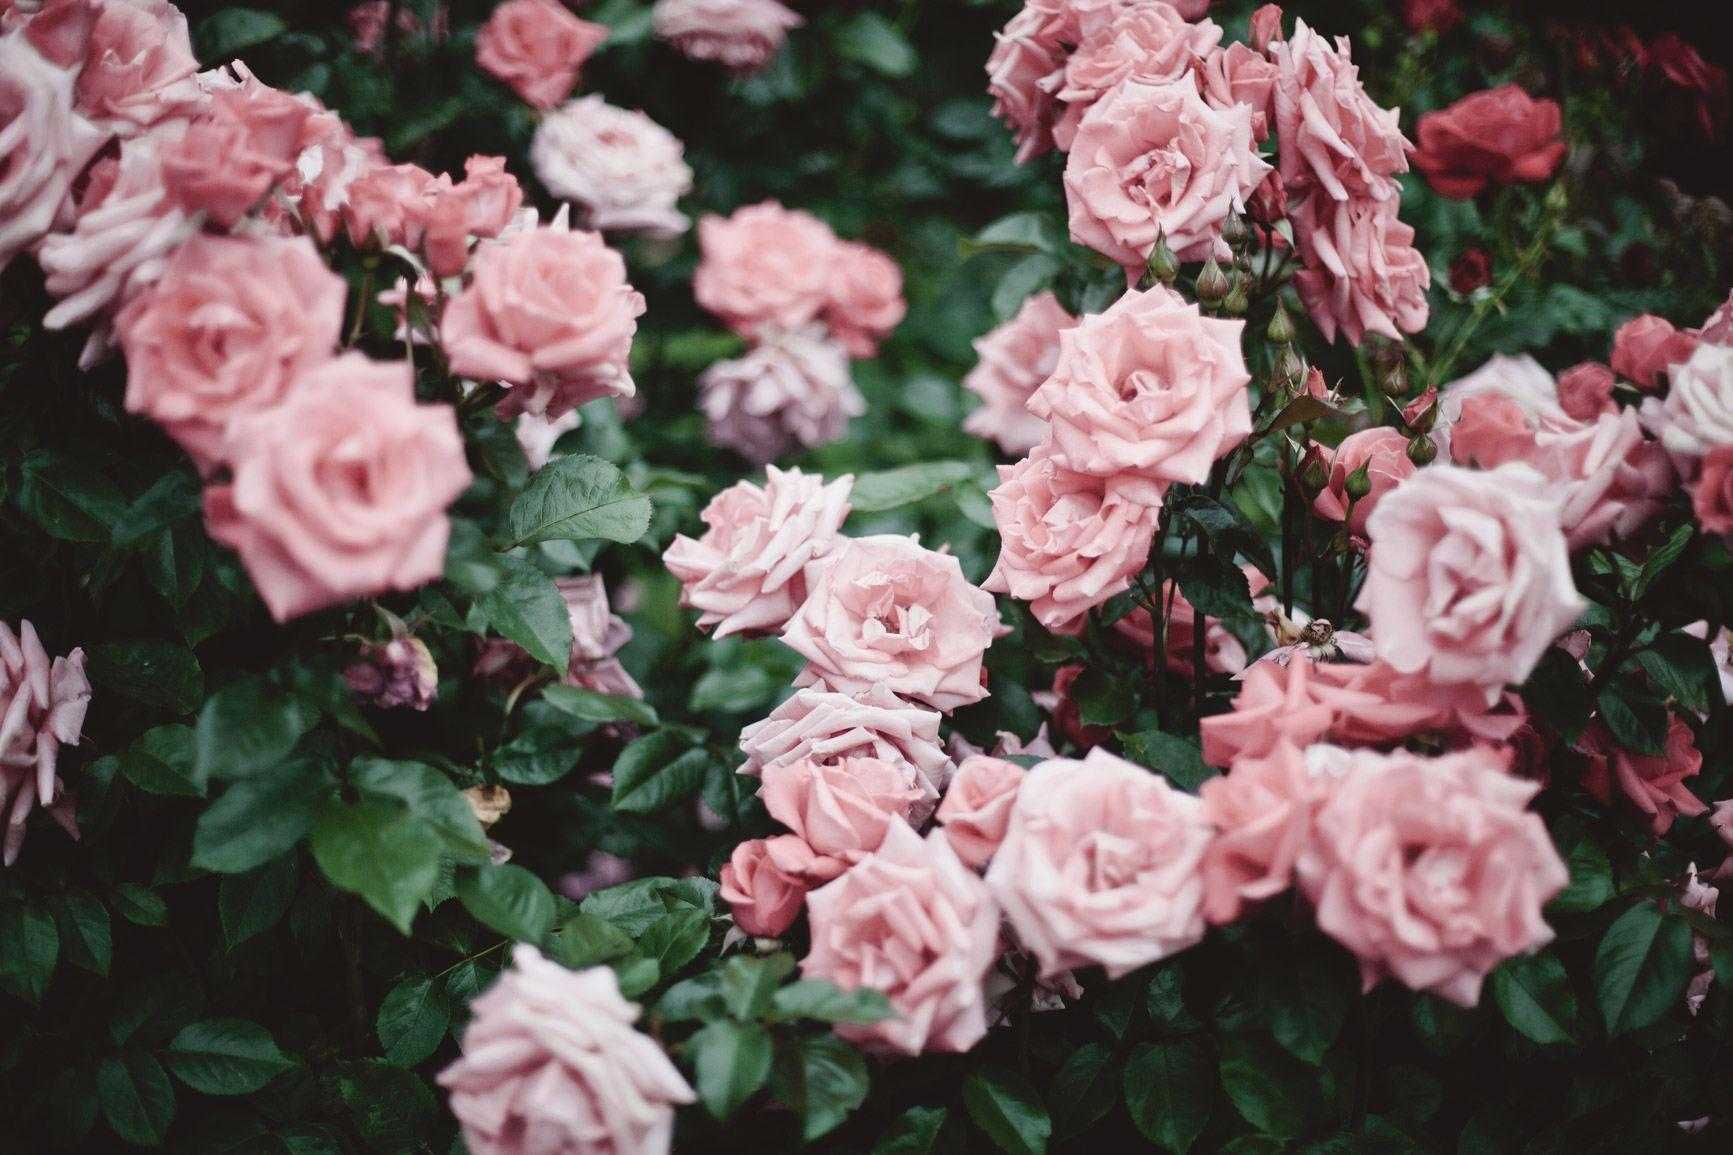 close up of pink roses at Portland Rose Garden